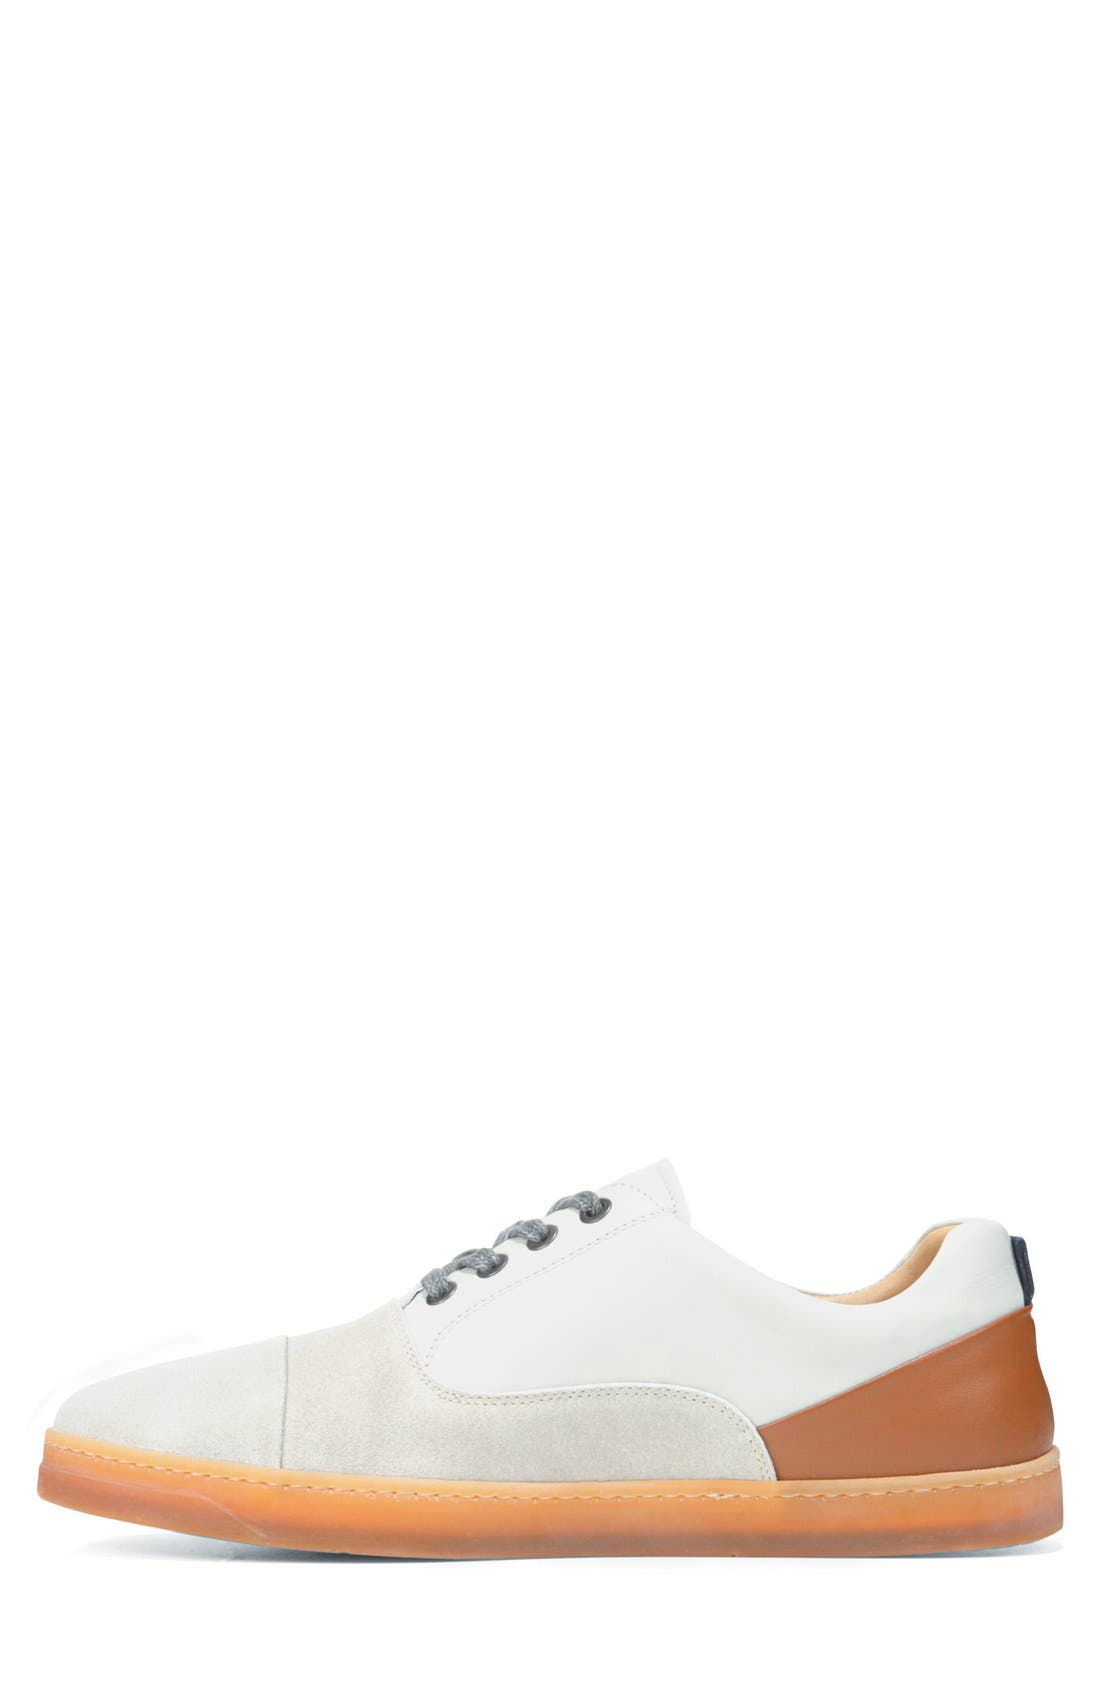 Baldwin Sneaker,                             Alternate thumbnail 12, color,